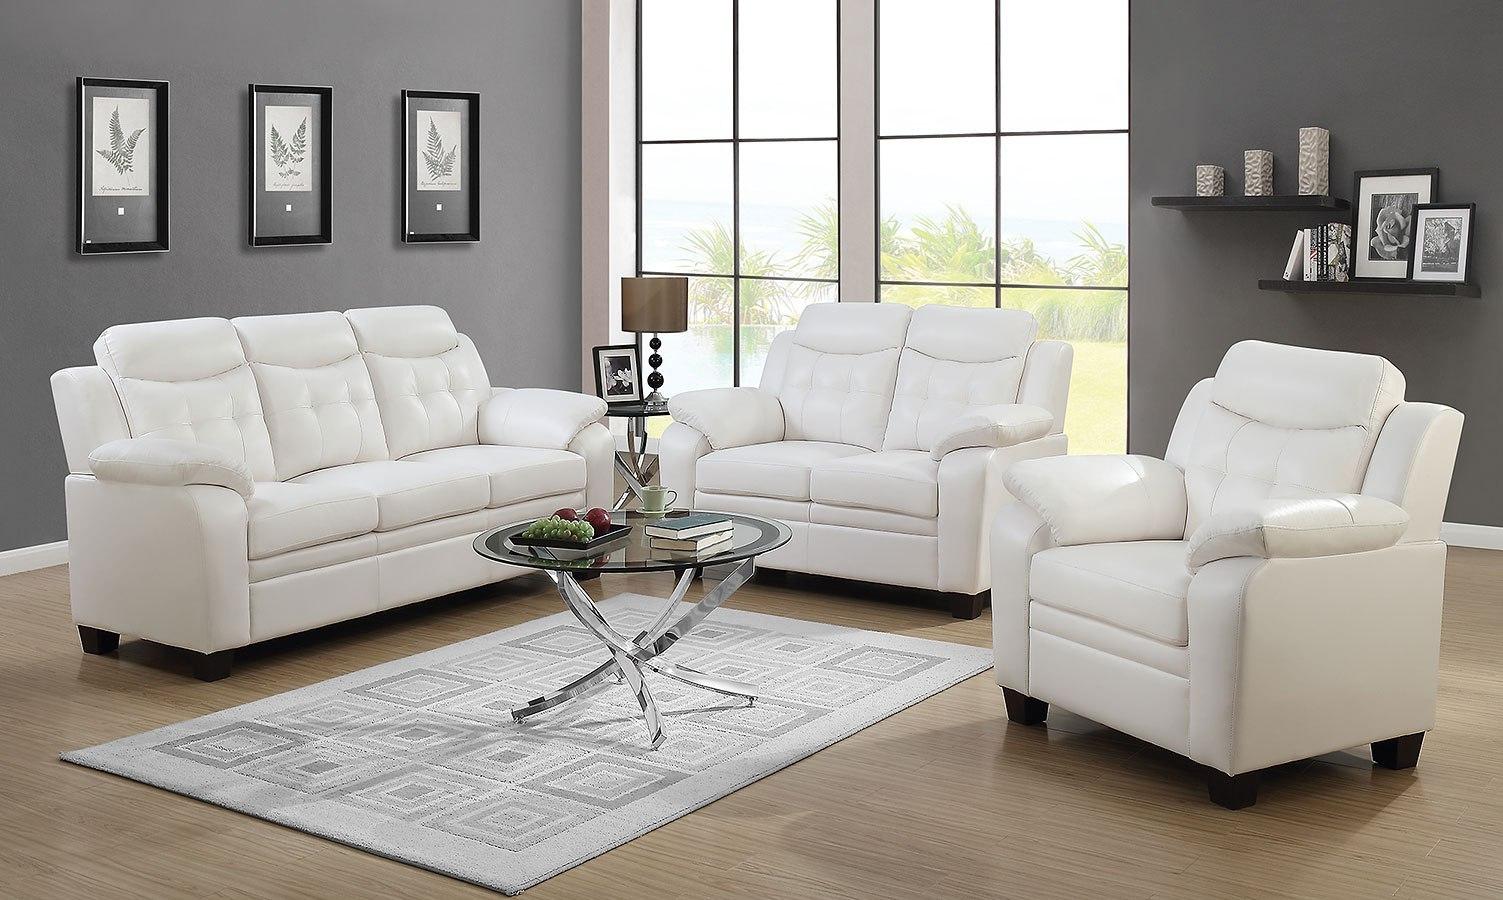 Finley living room set snow white coaster furniture furniture cart